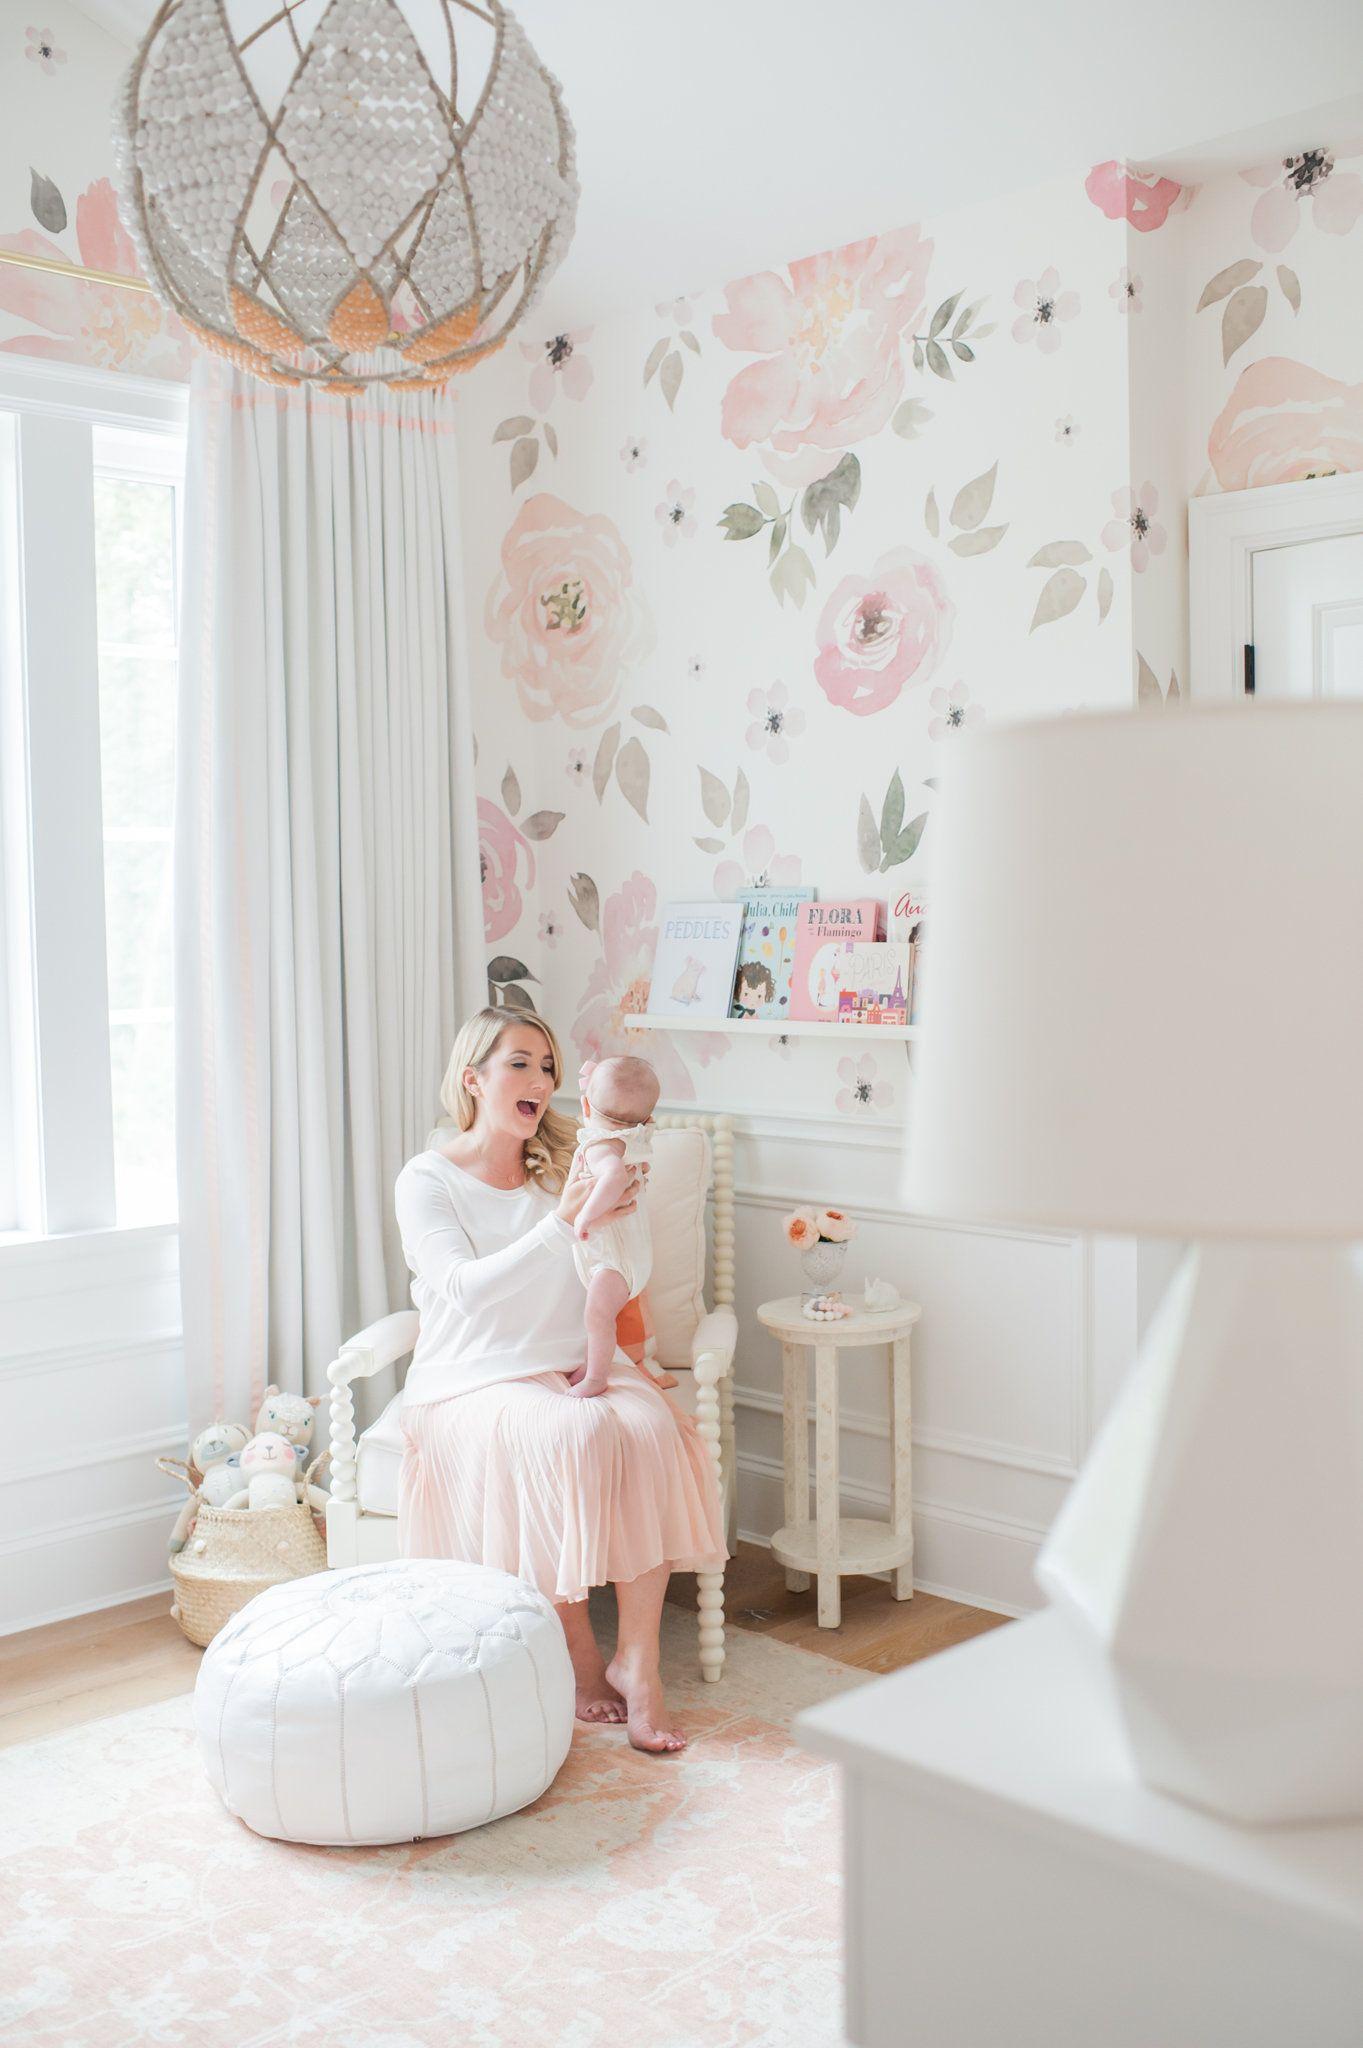 Lillya s Nursery & Giveaway Pinterest